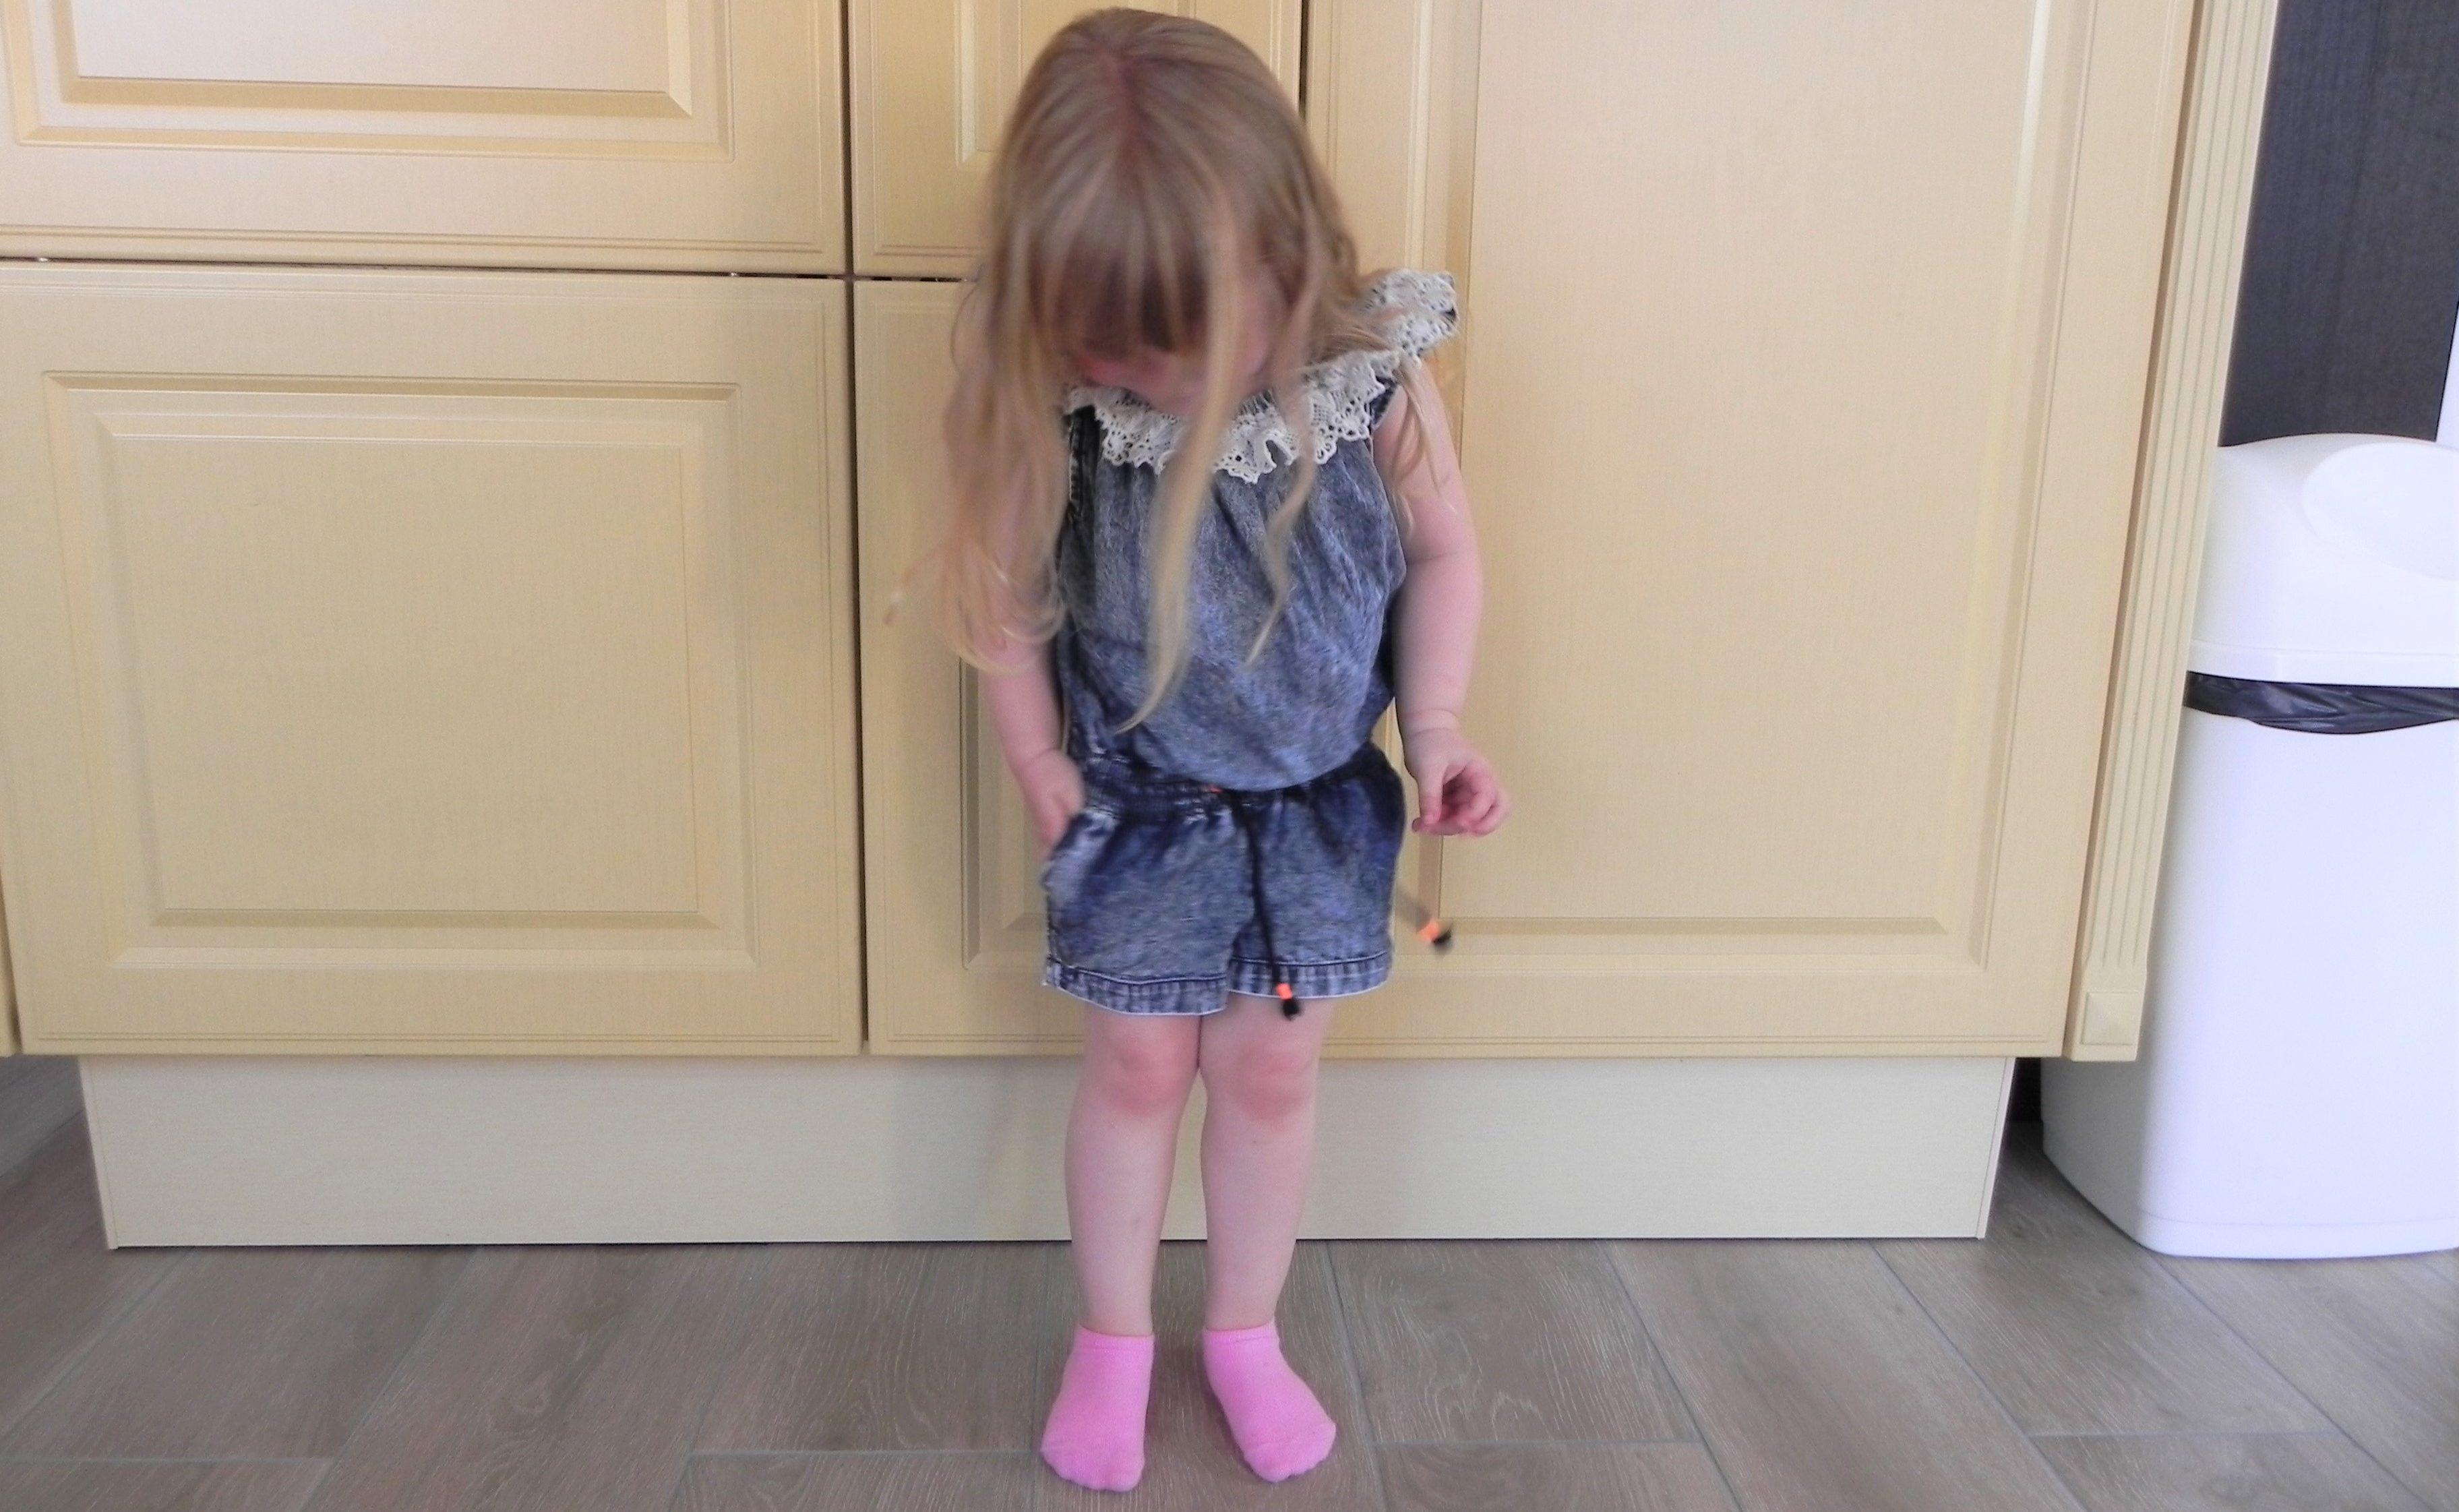 Vingino, kinderkleding, meisjeskleding, meisjesoutfit, kids jeans, kinder outfits, zomerkleren meisjes, blog Vingino, mamablog, lifestyleblog, mamalifestyleblog, la log, lalog.nl